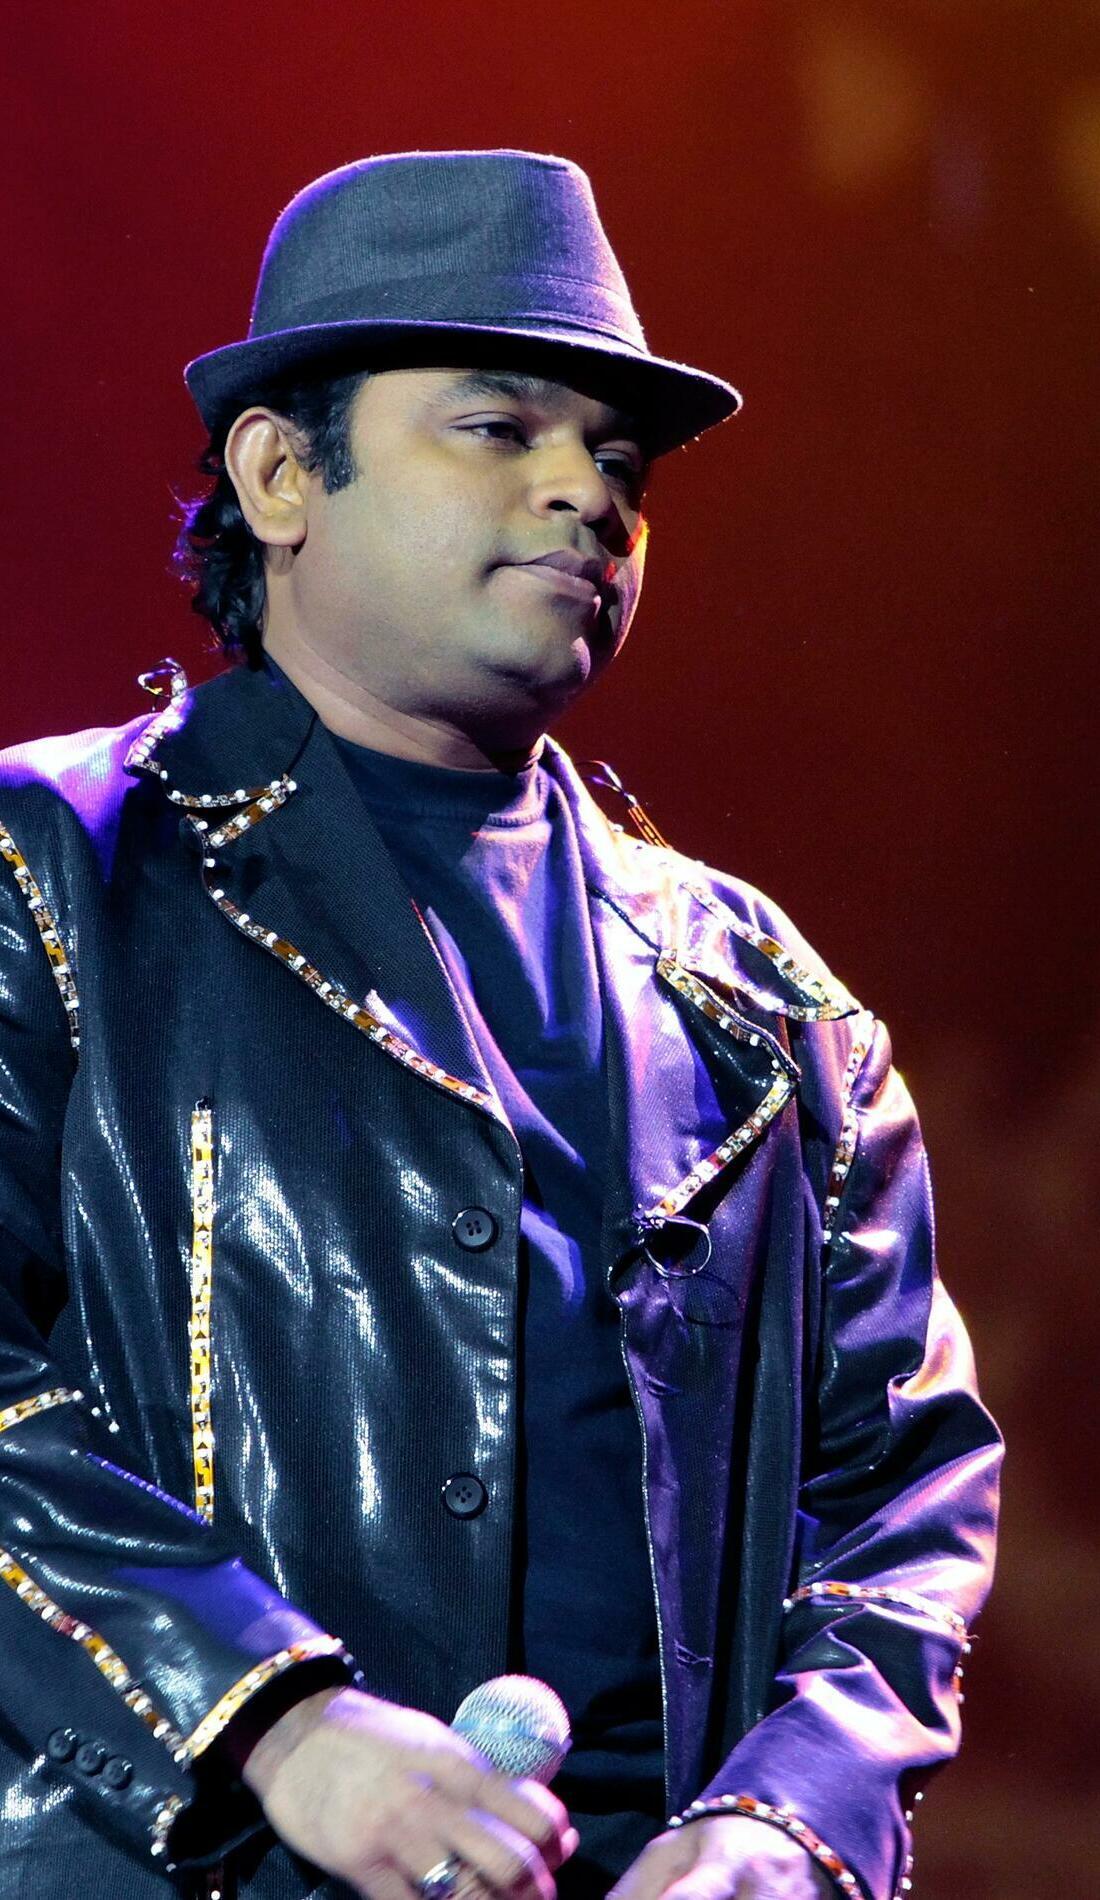 A A.R. Rahman live event